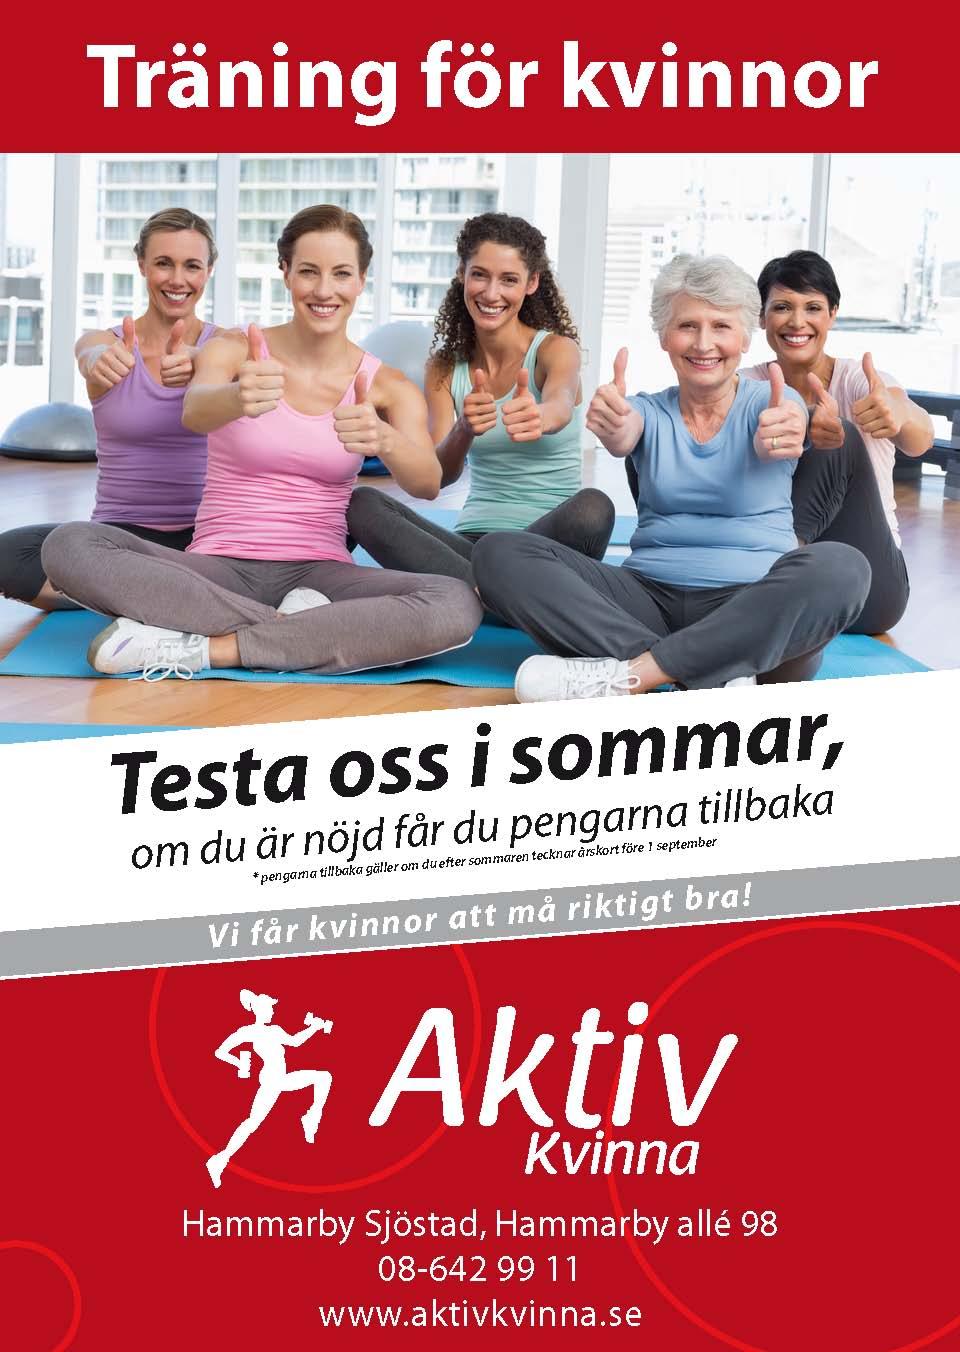 Affisch_Testa oss i_sommar-2016_Sjöstaden